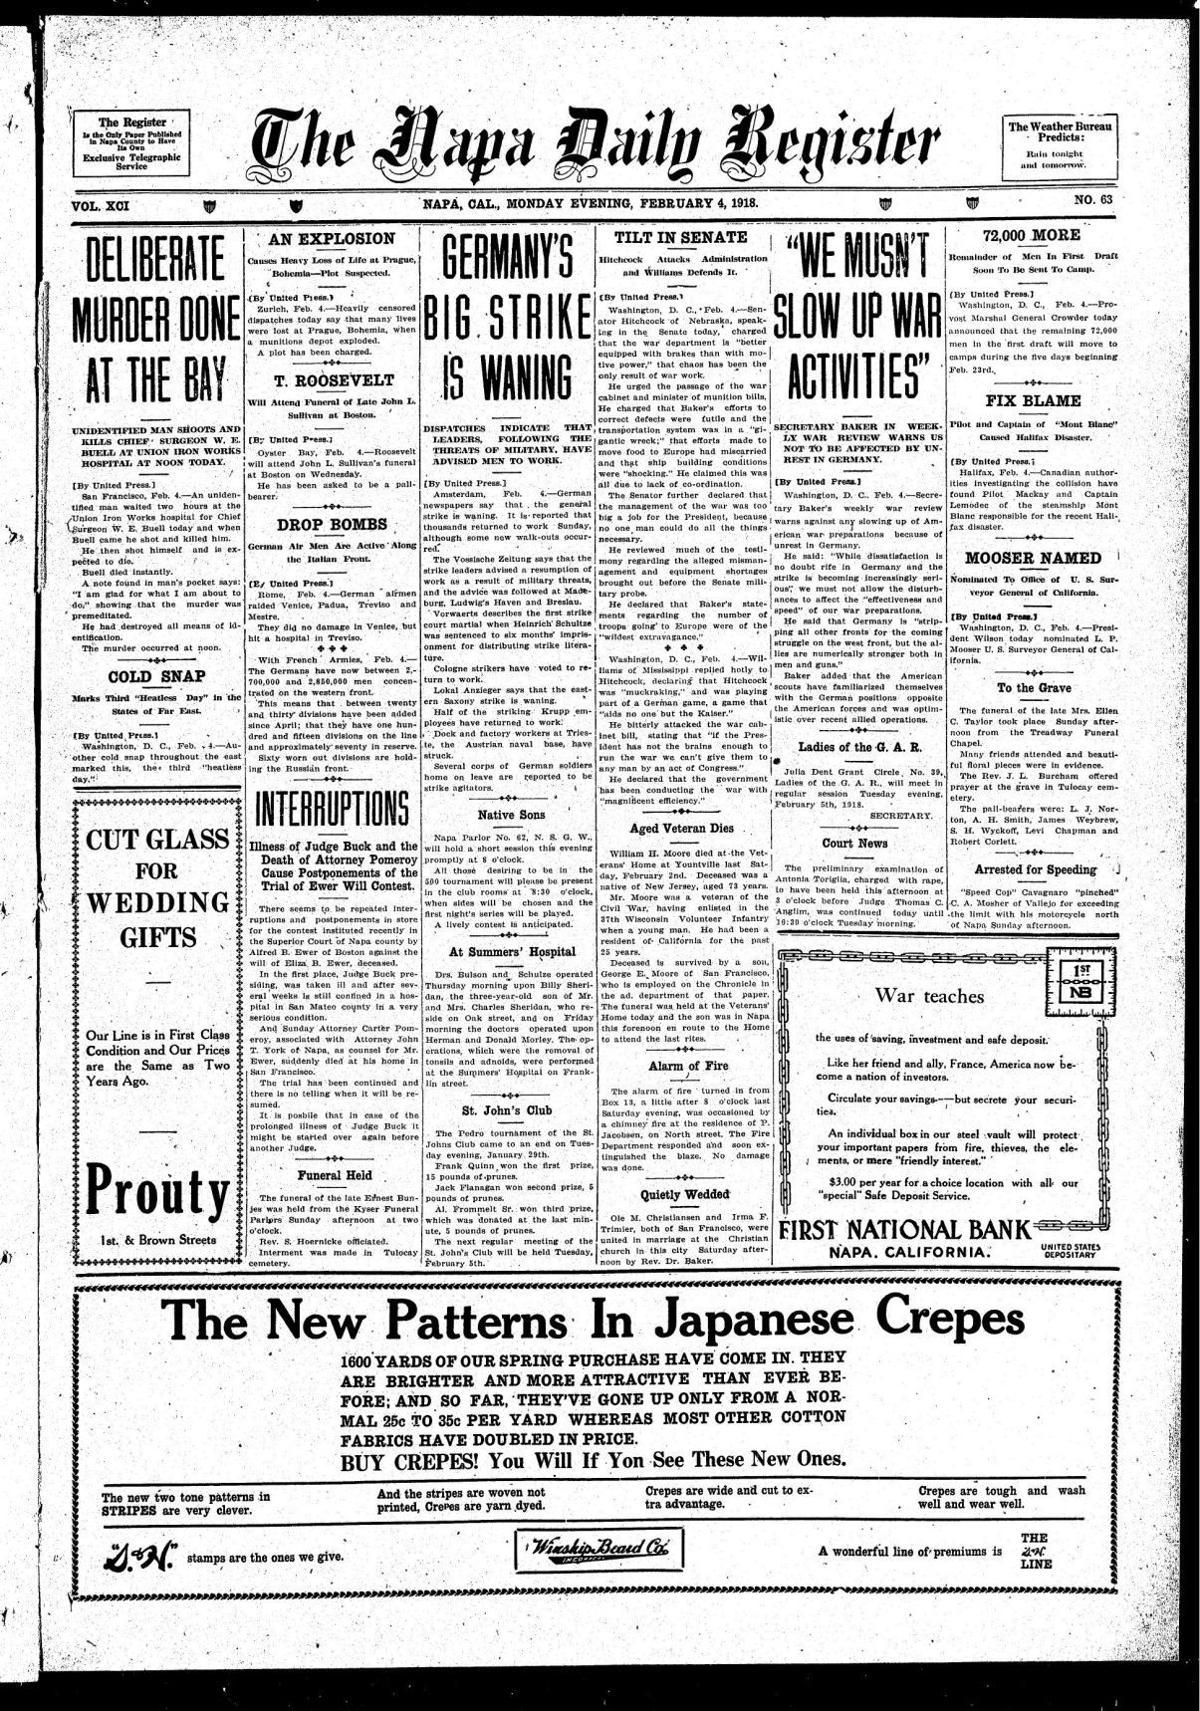 Feb. 4, 1918